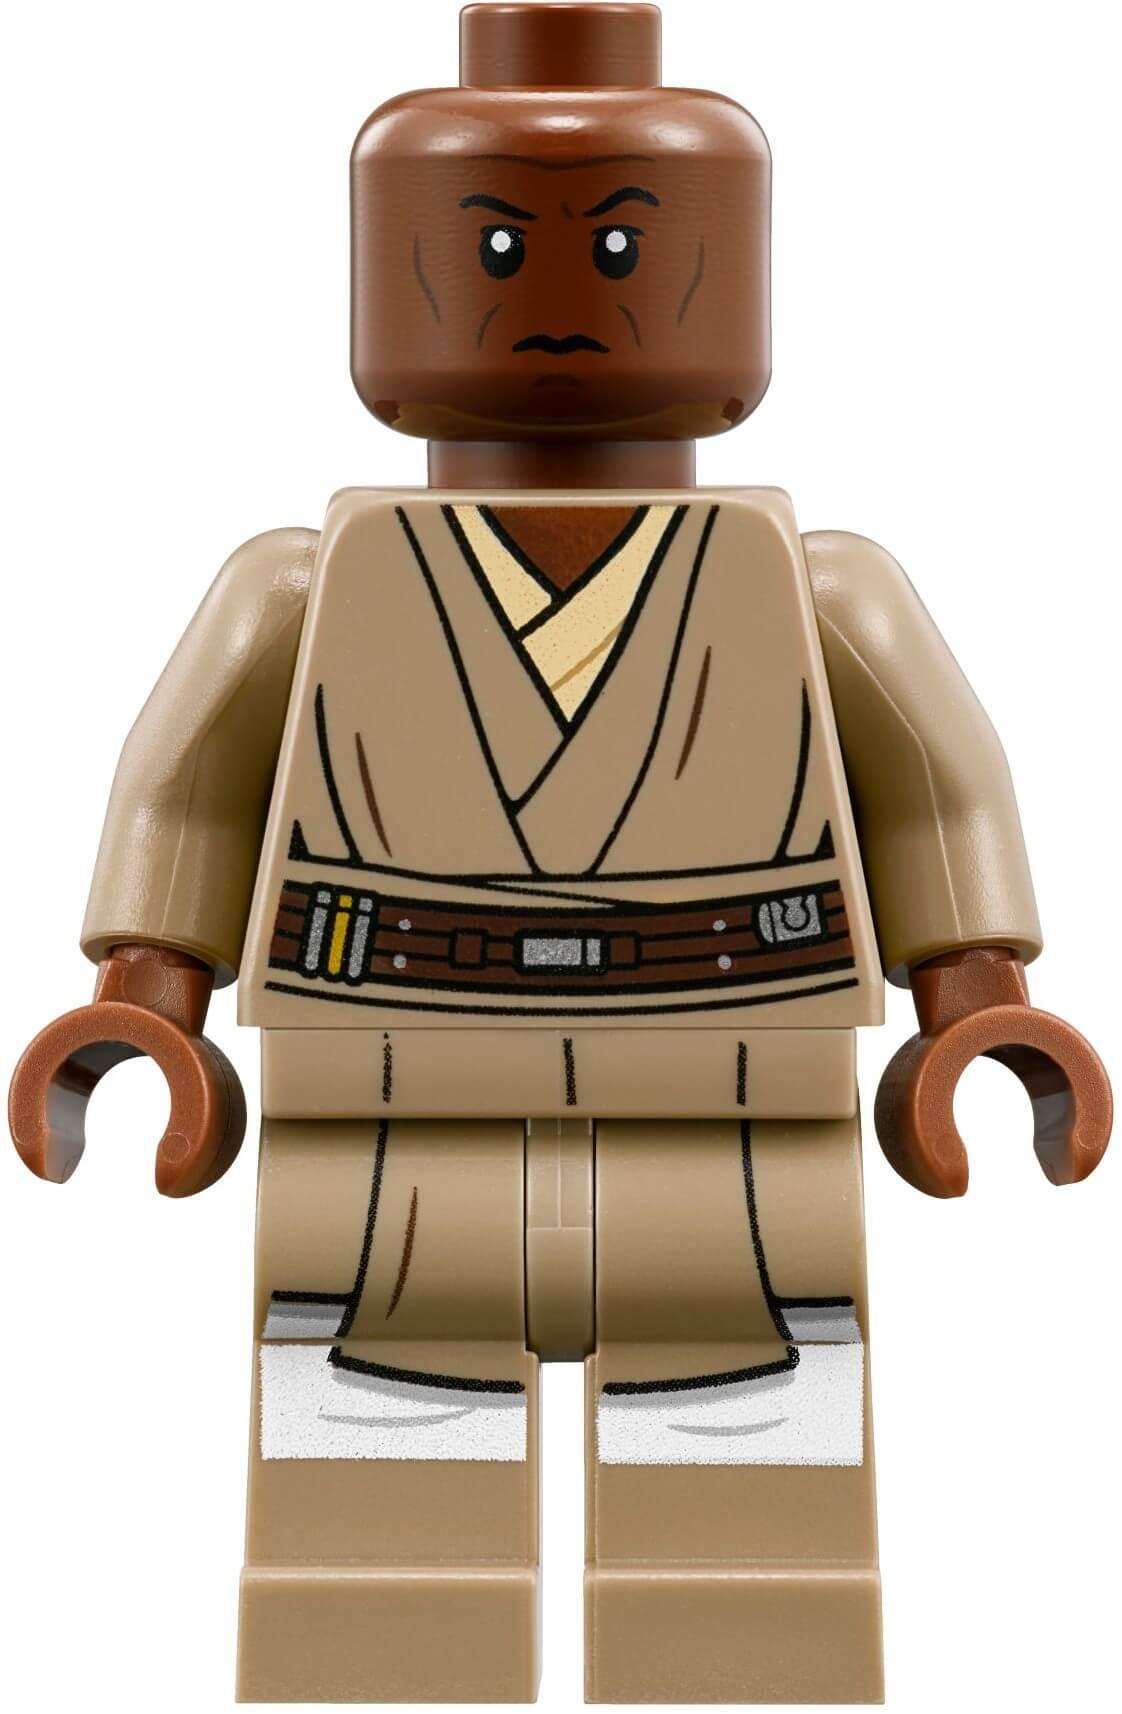 Mua đồ chơi LEGO 75199 - LEGO Star Wars 75199 - Xe Phản Lực của Tướng Grievous (LEGO Star Wars 75199 General Grievous' Combat Speeder)